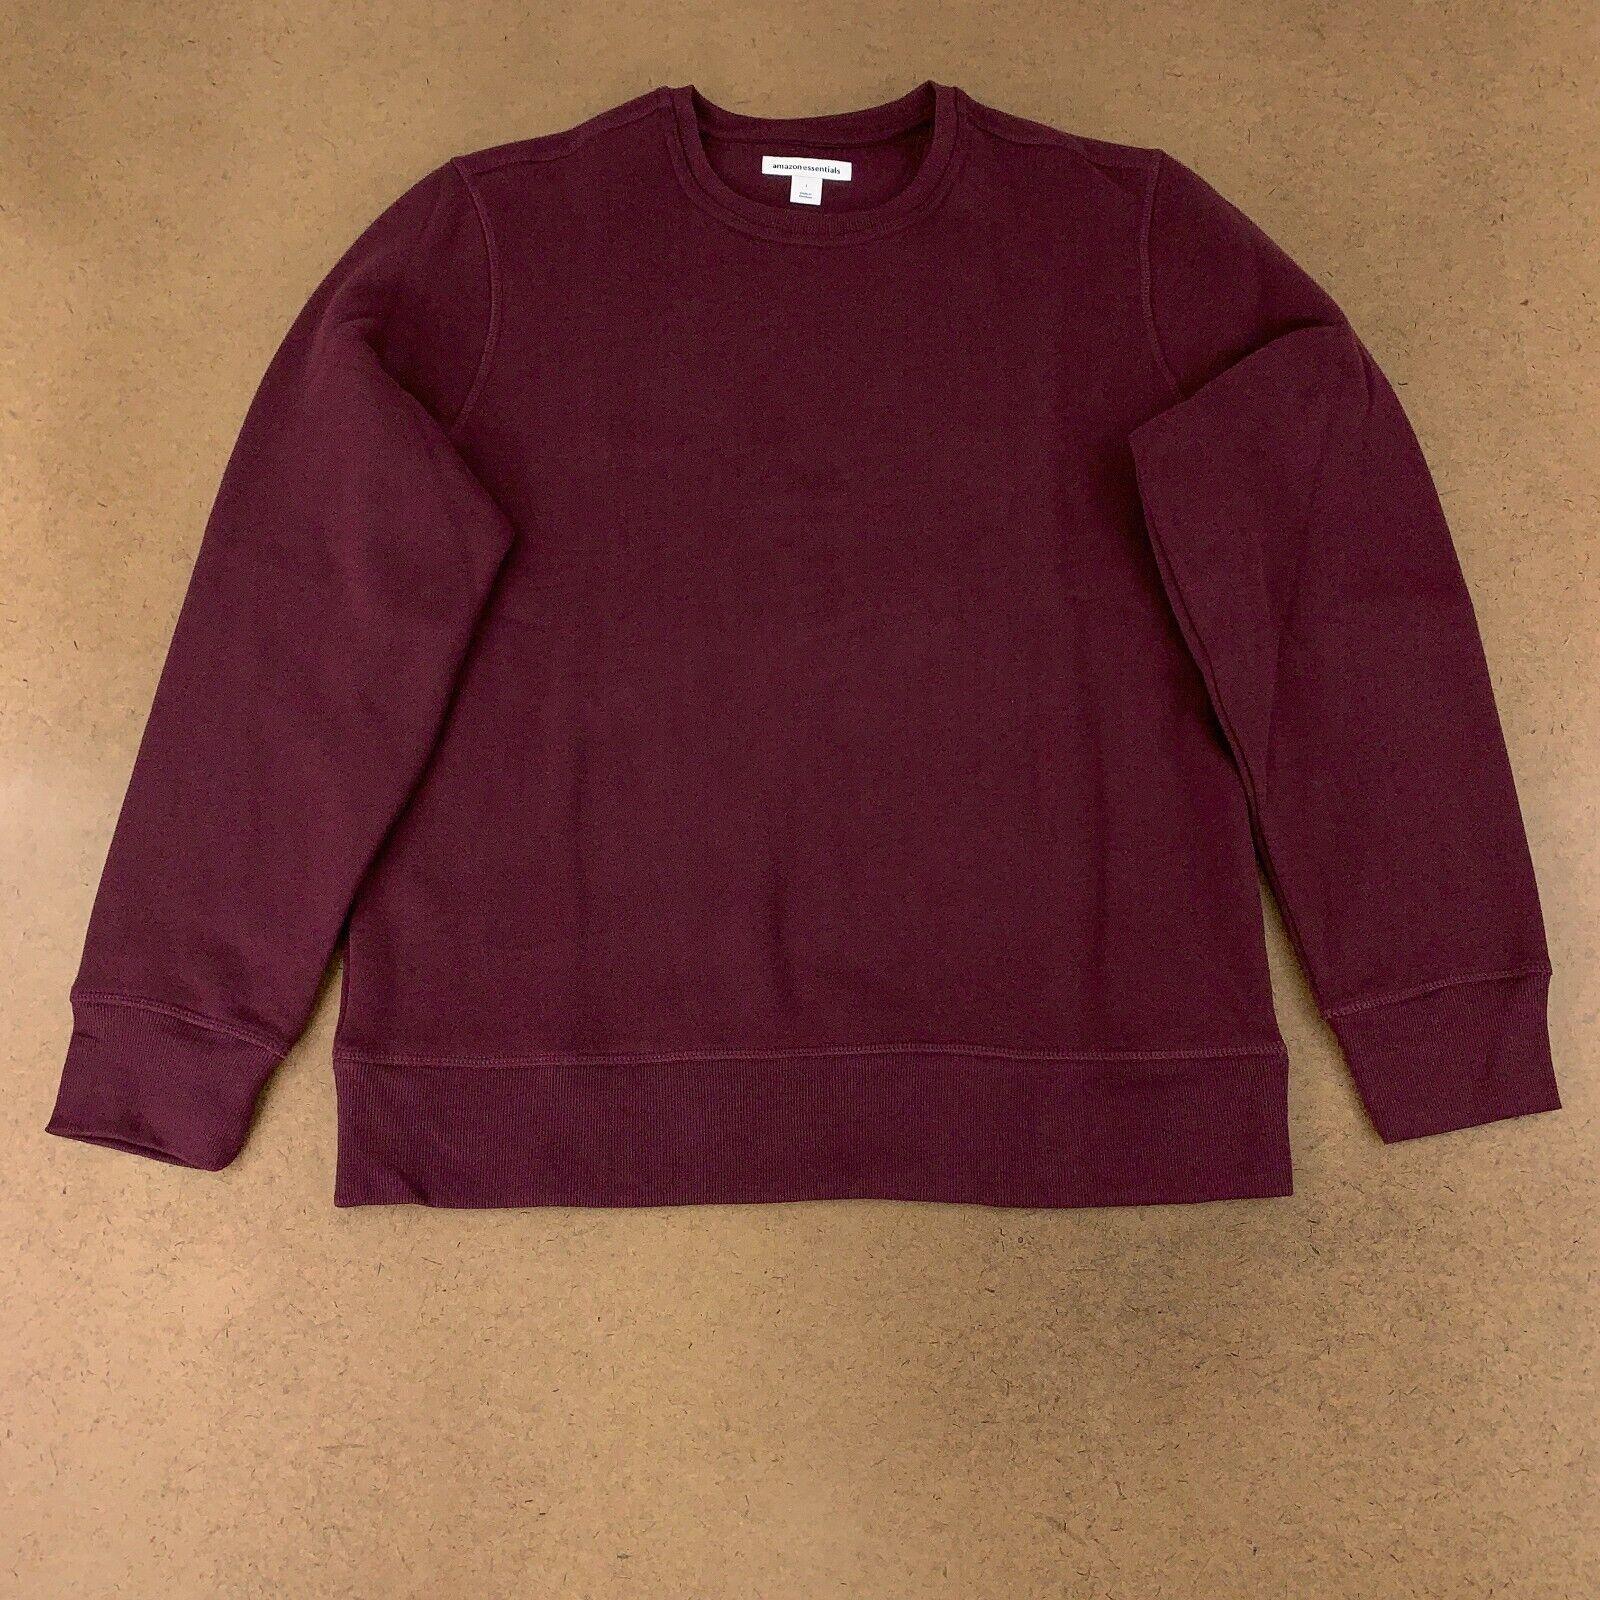 Amazon Essentials Men's Size Large Burgundy Fleece Crewneck Sweatshirt NWT